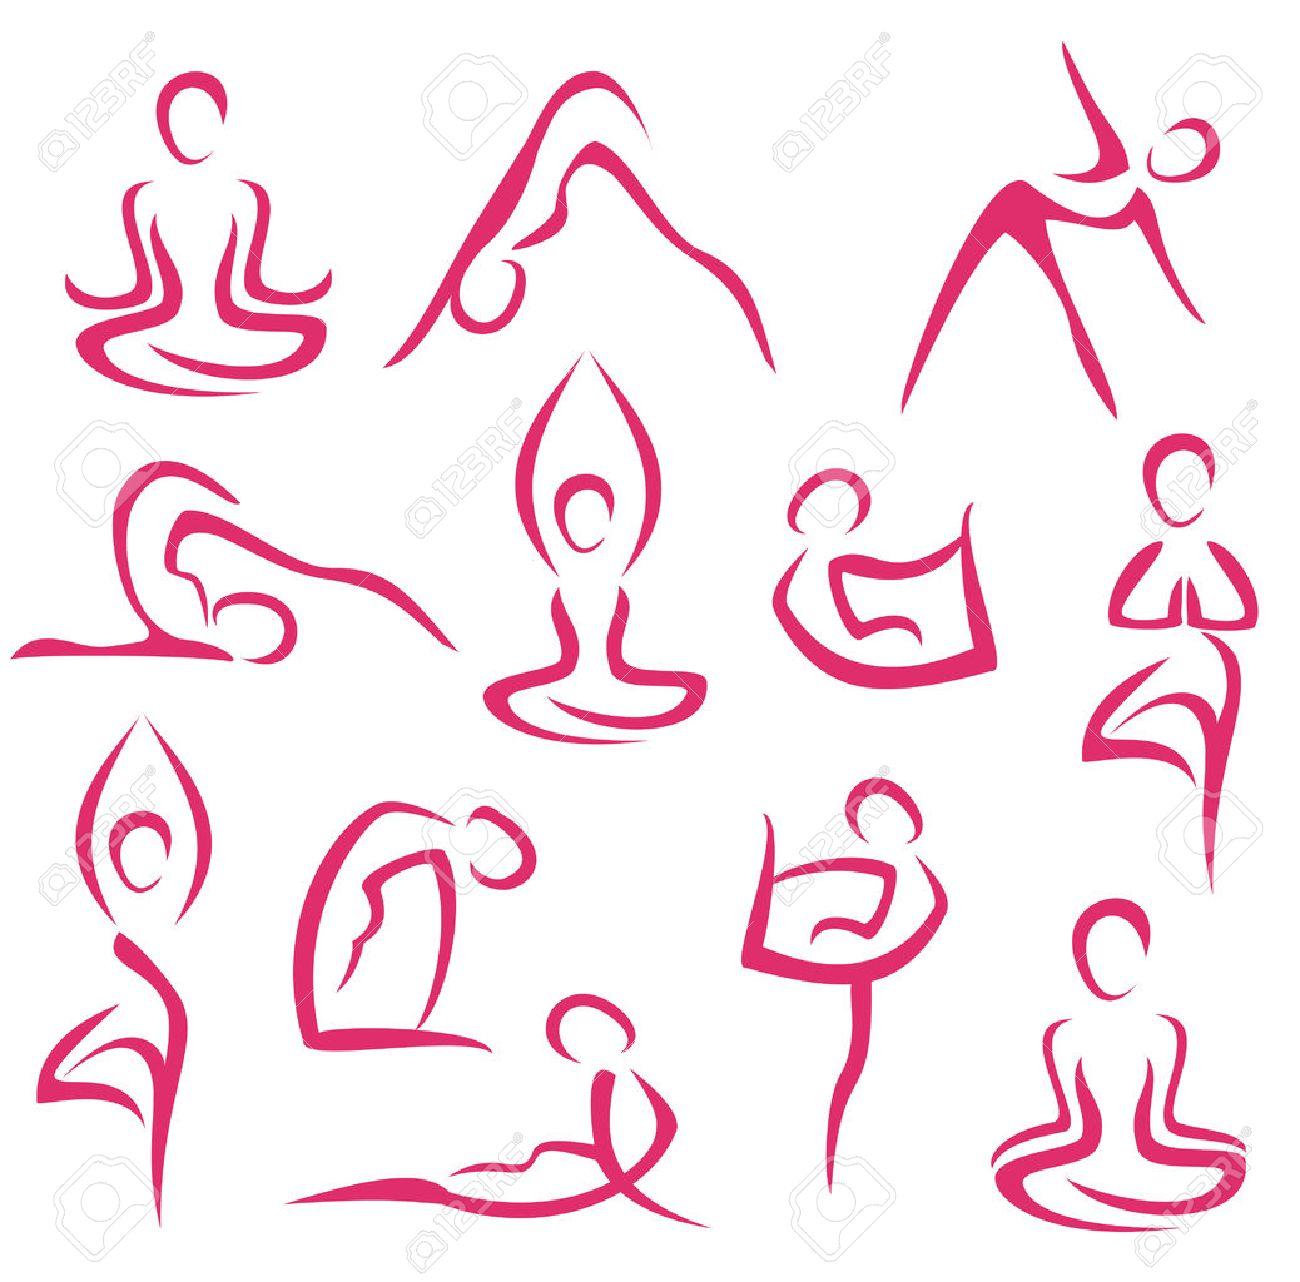 big set of yoga, pilates symbols - 22336533